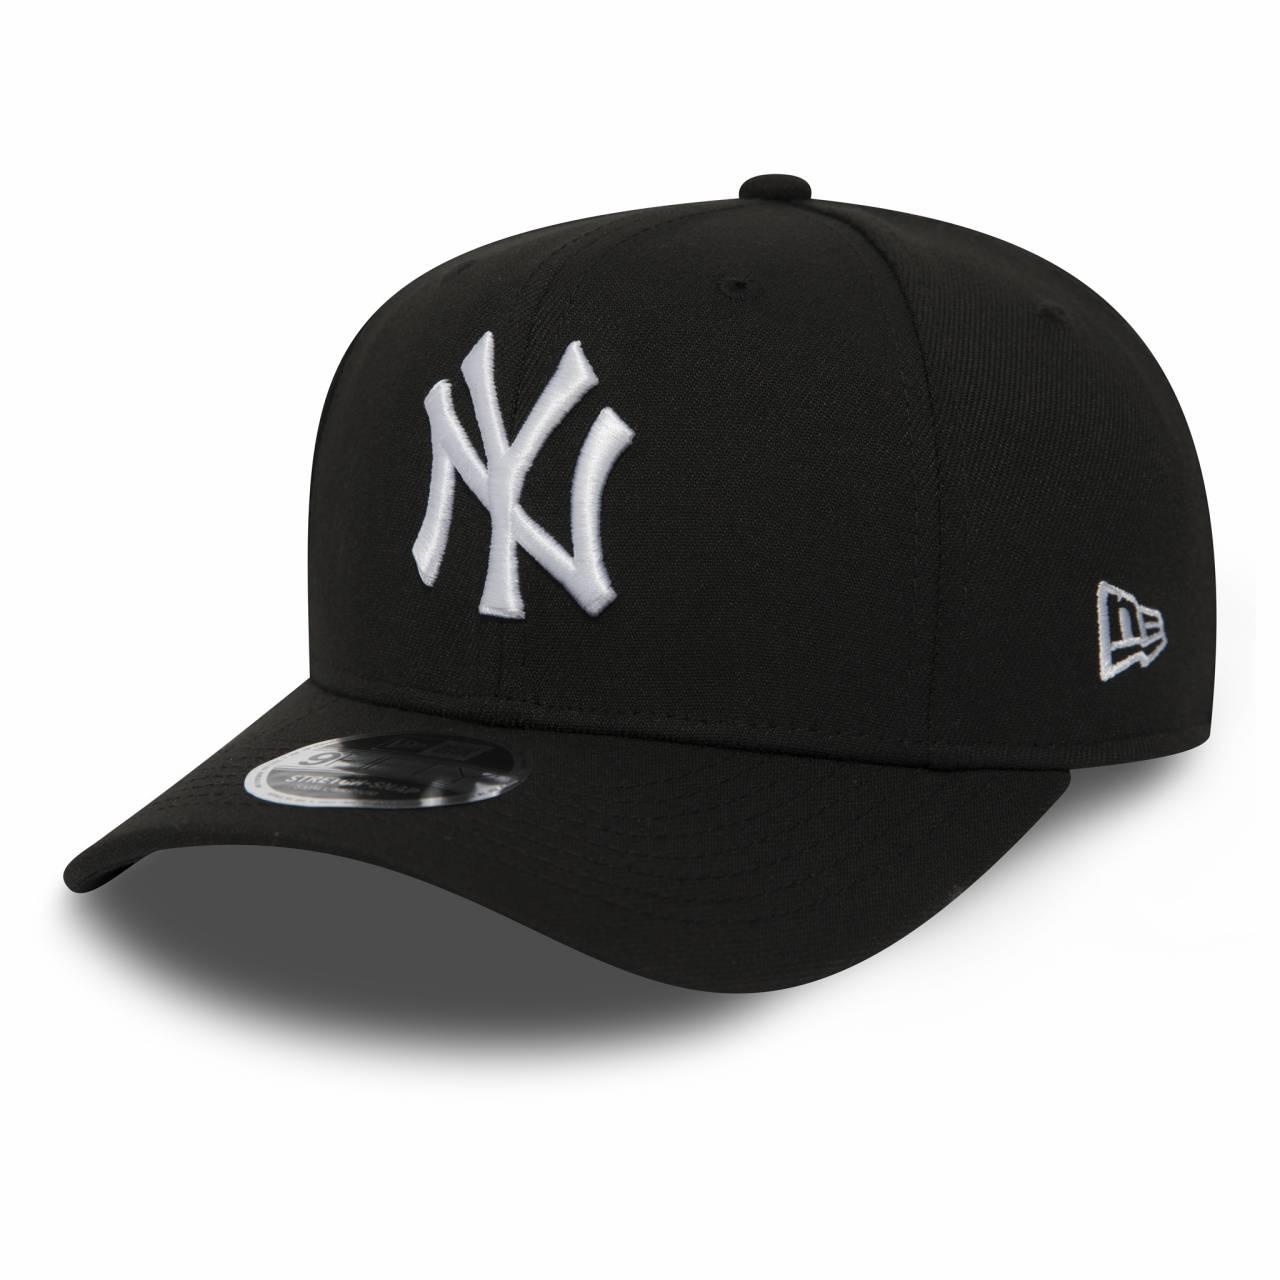 9FIFTY MLB NEW YORK YANKEES STRETCH SNAP SCHWARZ